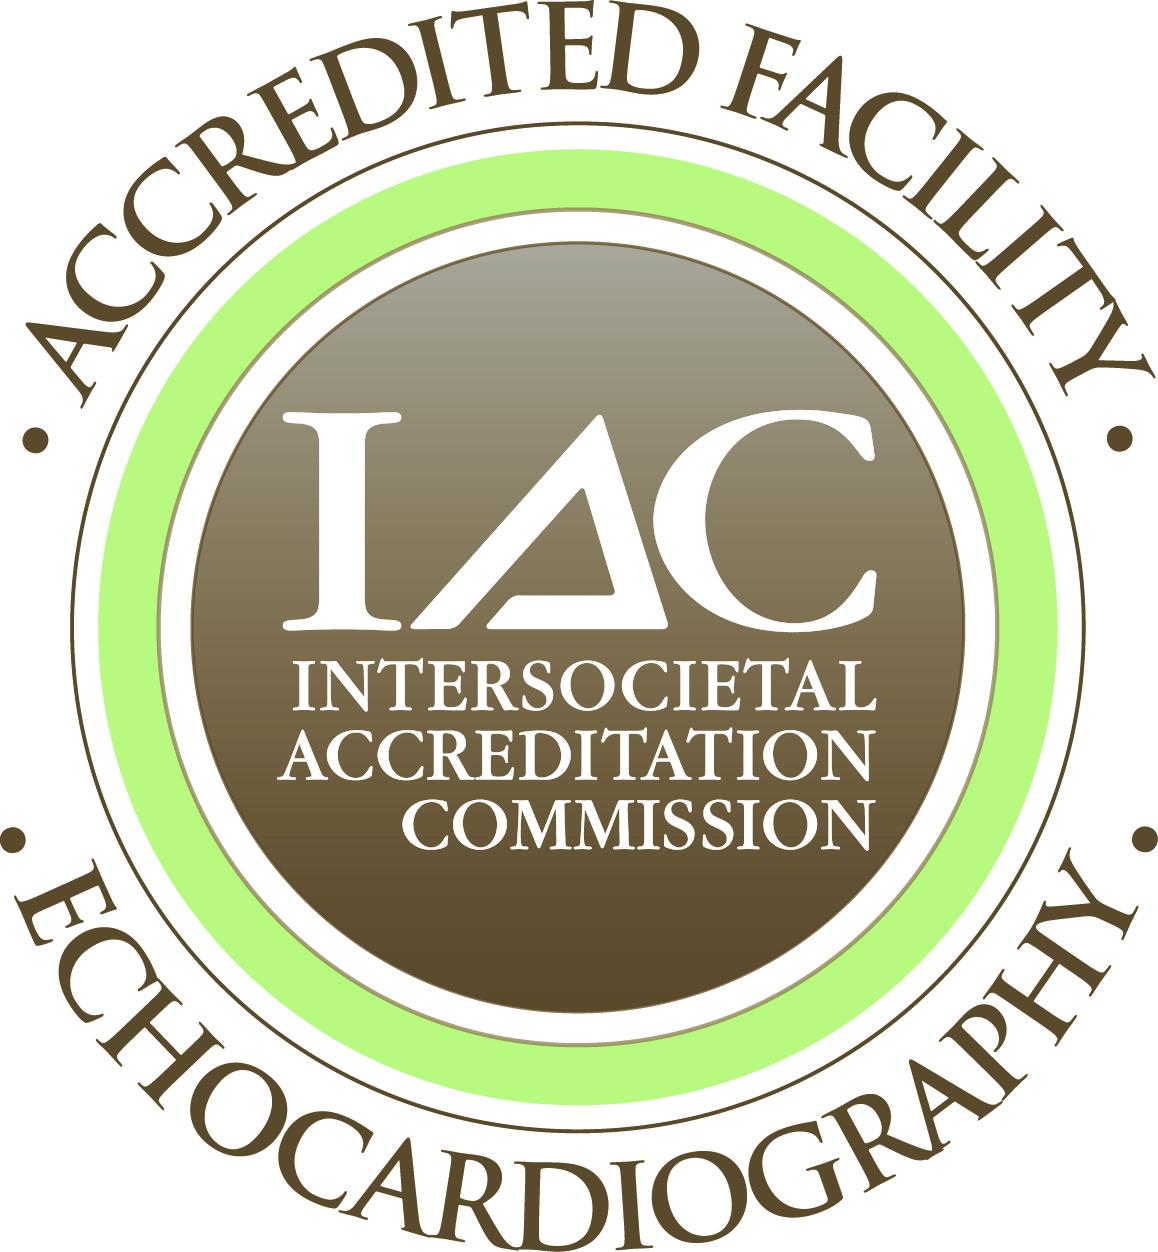 intersocietal accreditation commission seal